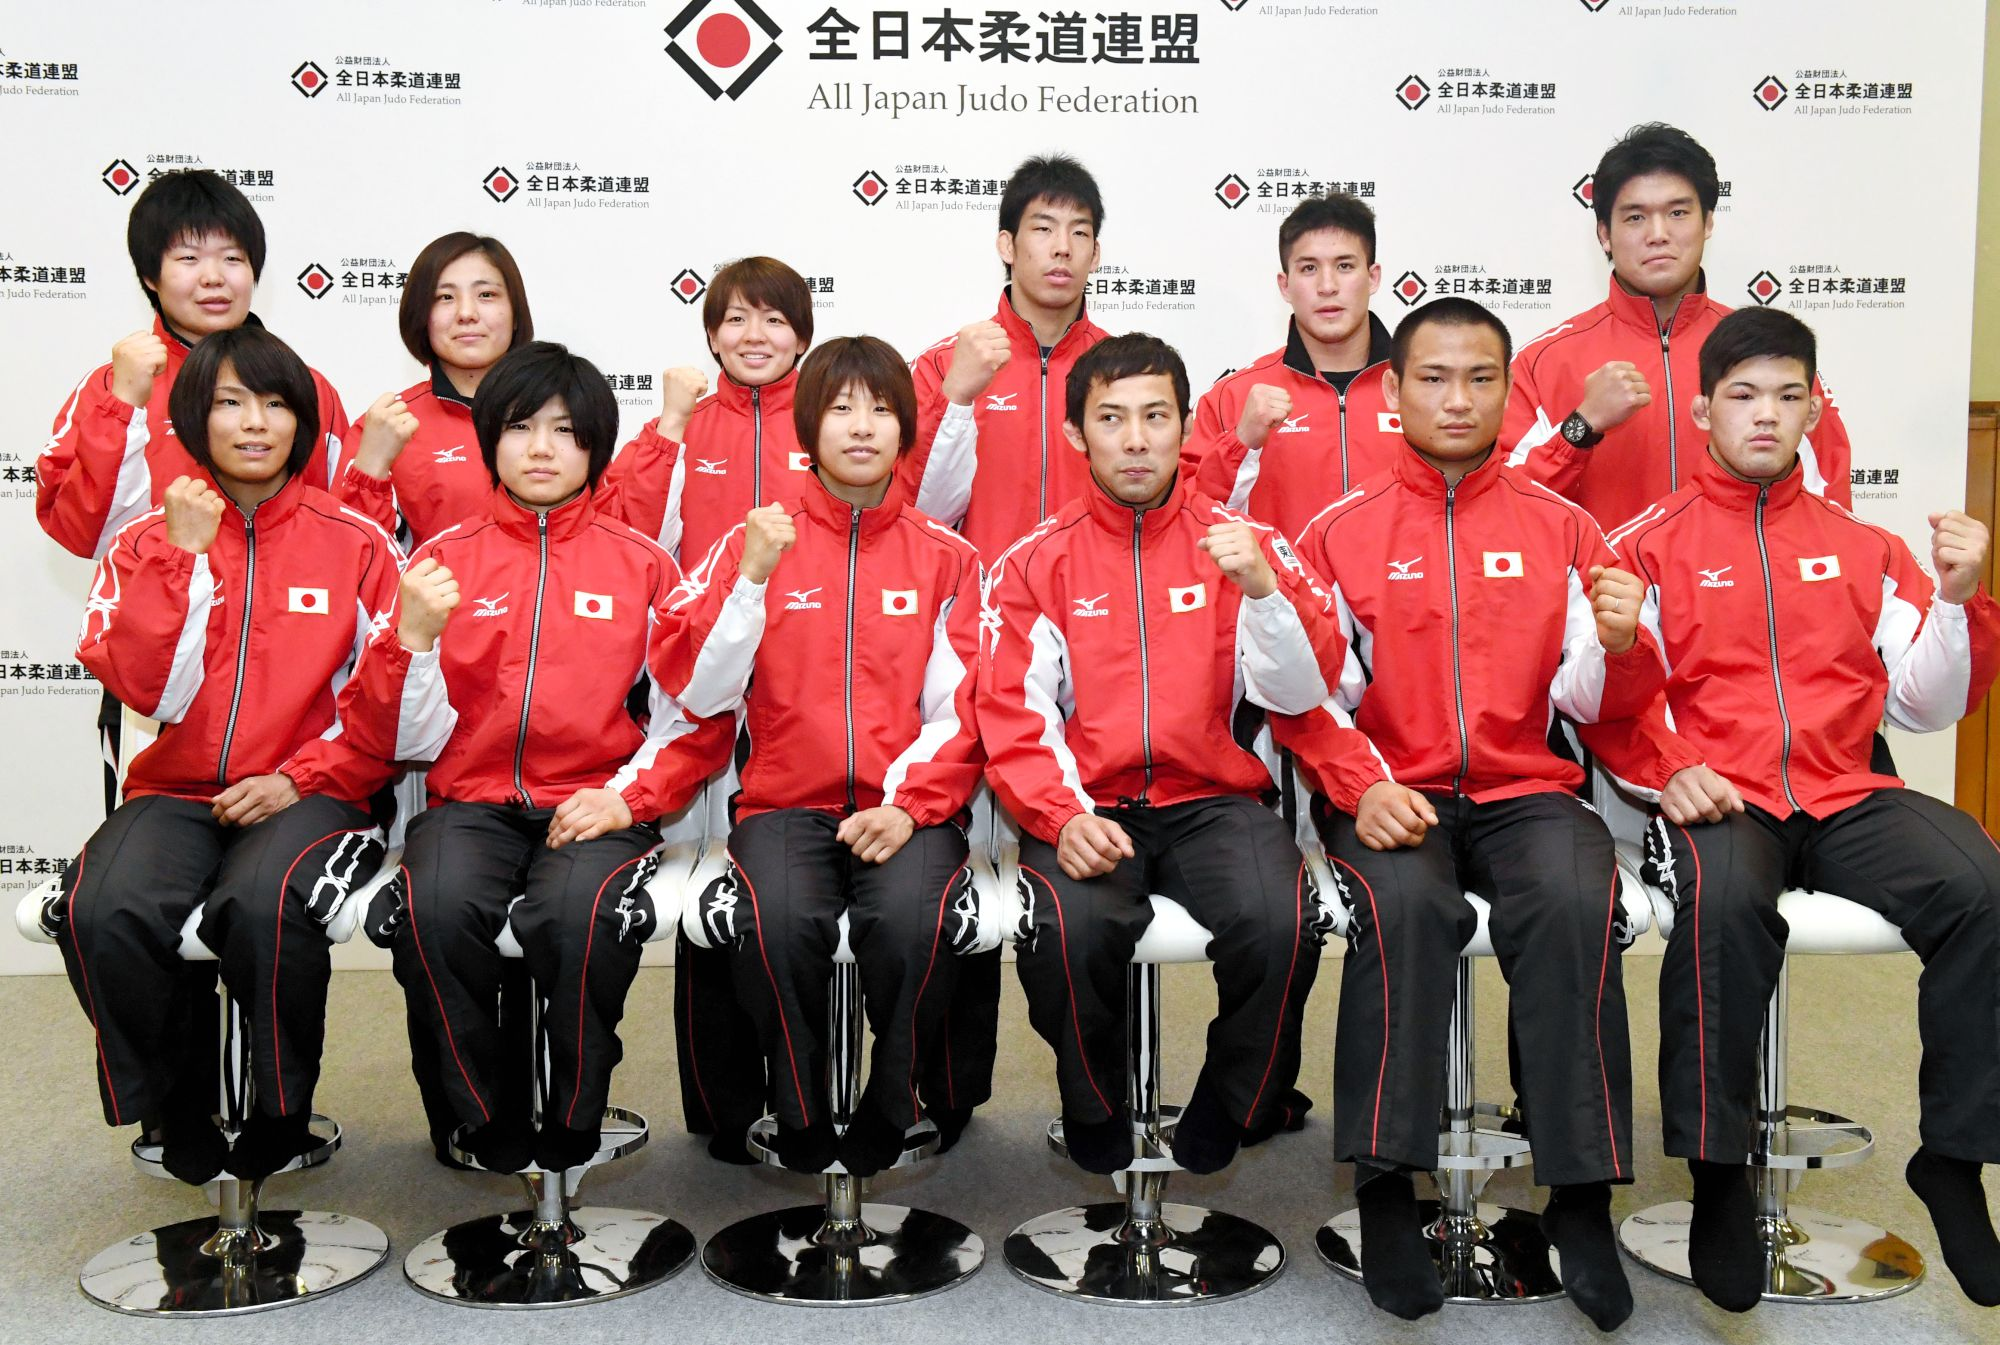 The Asahi Shimbun | Upcomingcarshq.com - photo#14